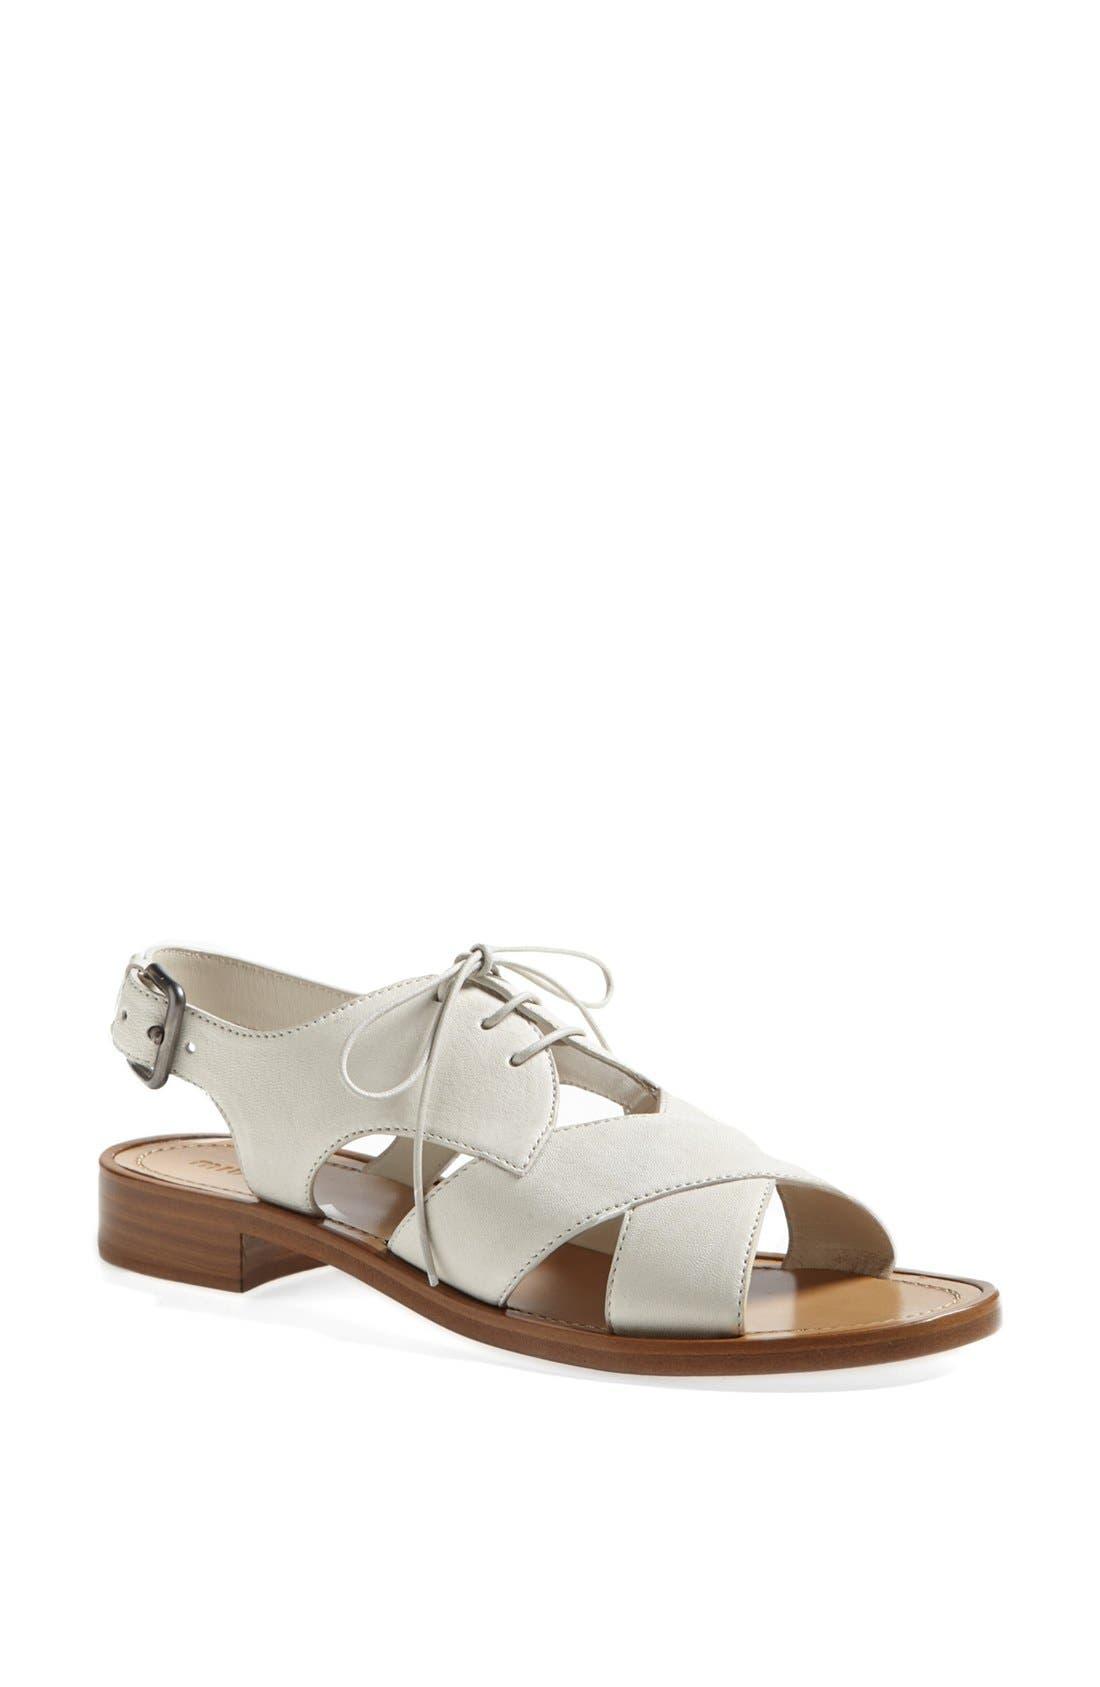 Main Image - Miu Miu Lace-Up Sandal